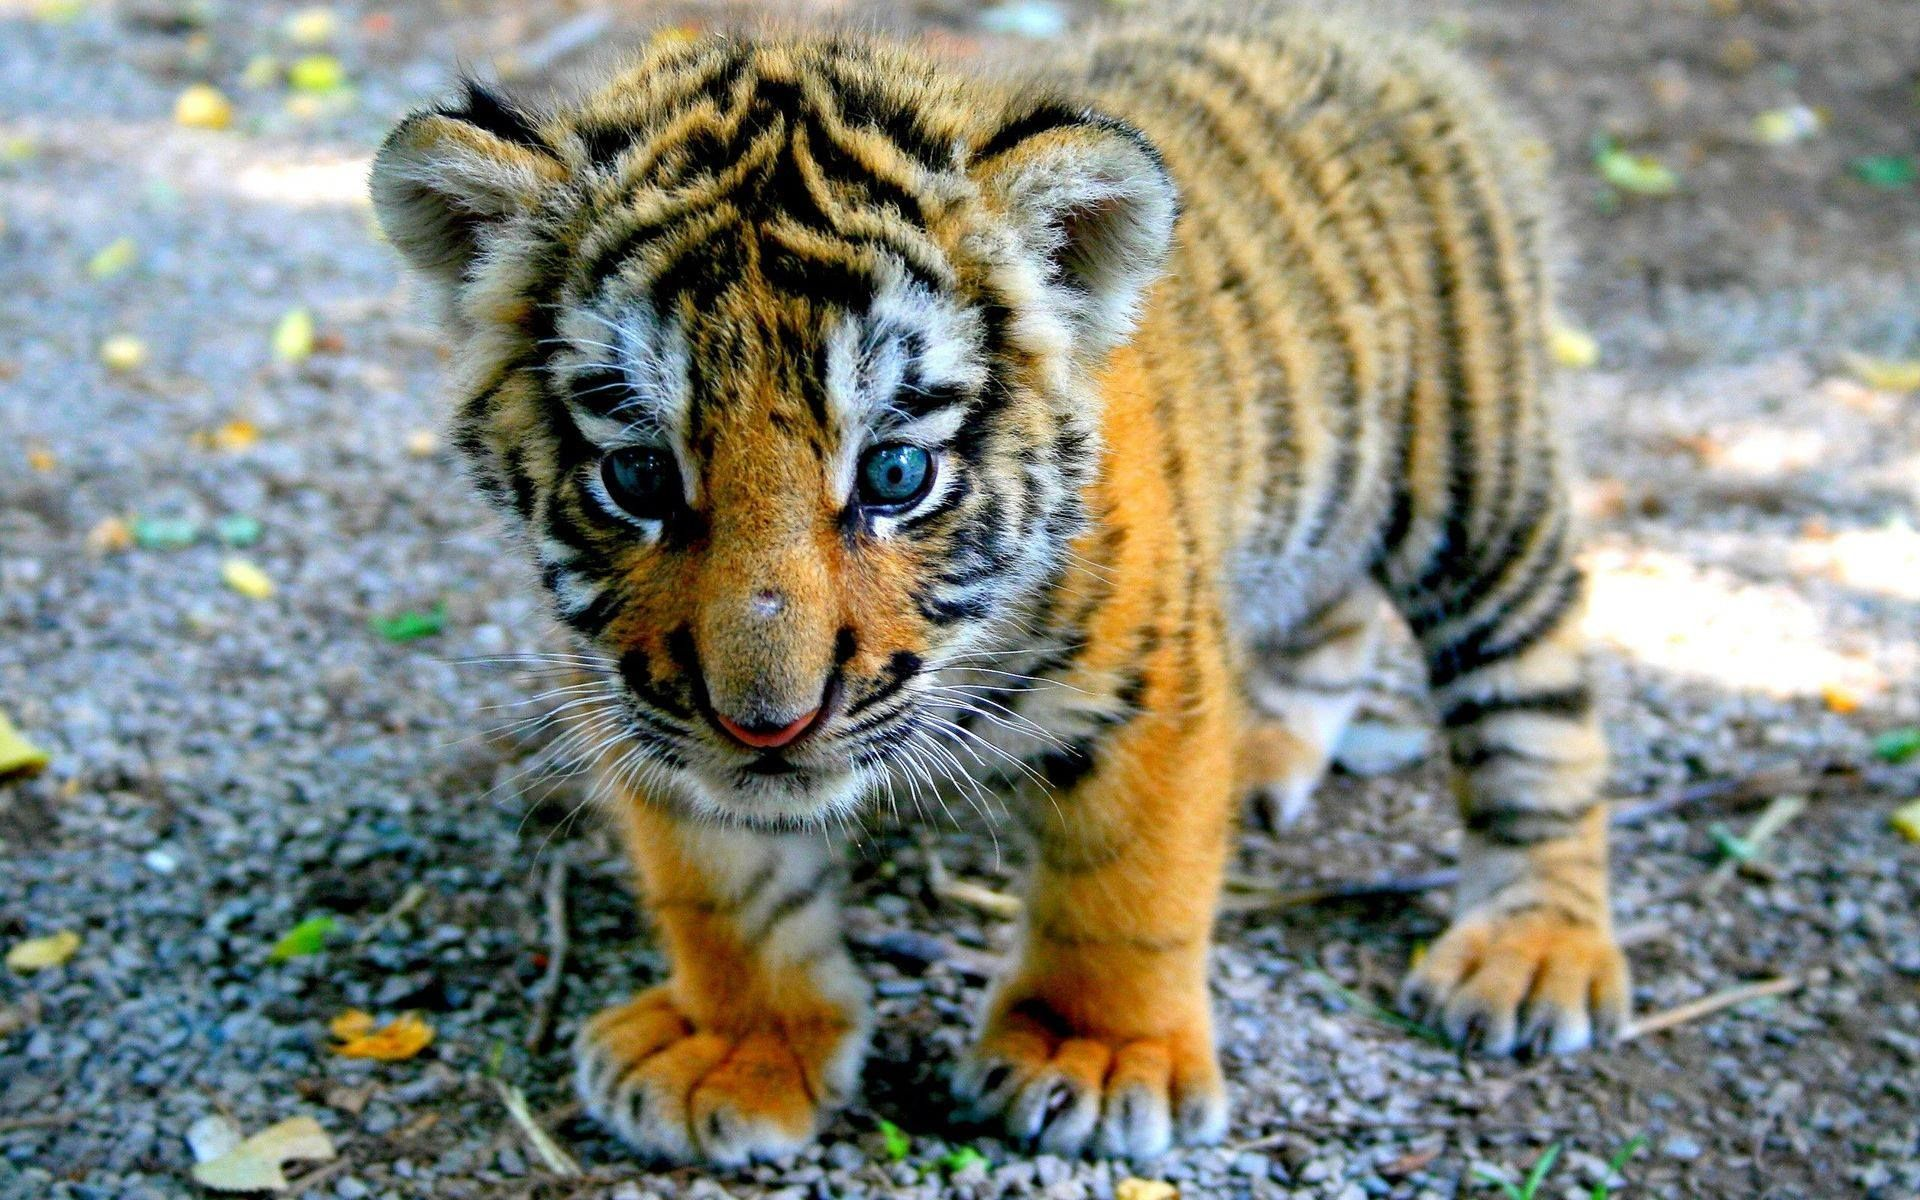 tigre bebe - Buscar con Google | Felinos | Pinterest